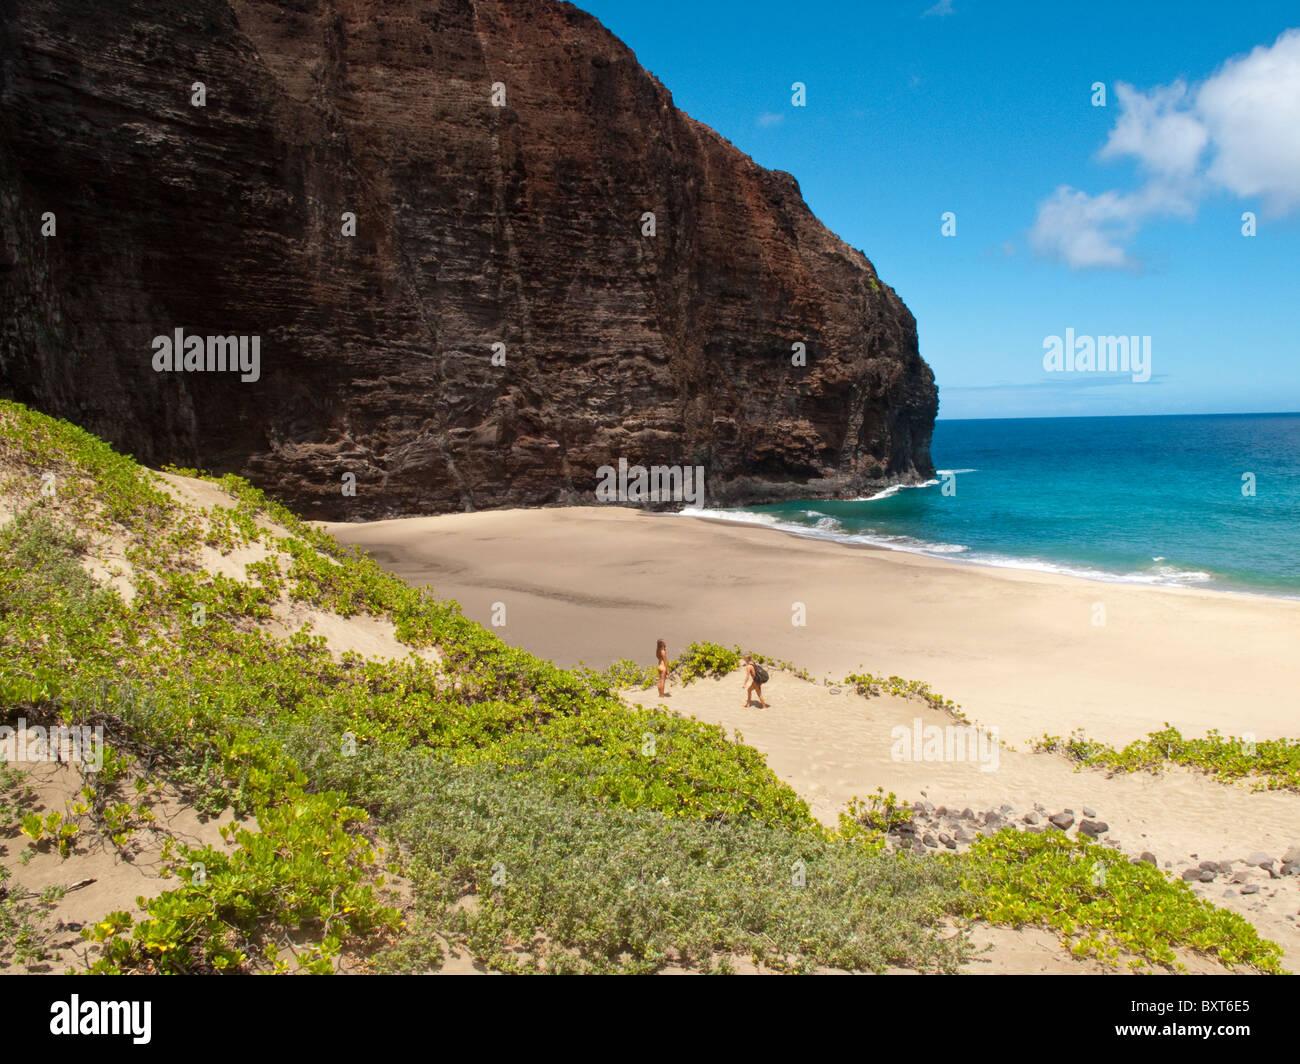 Women hiking in the sand at Honopu beach, Na Pali coastline, Kauai Stock Photo